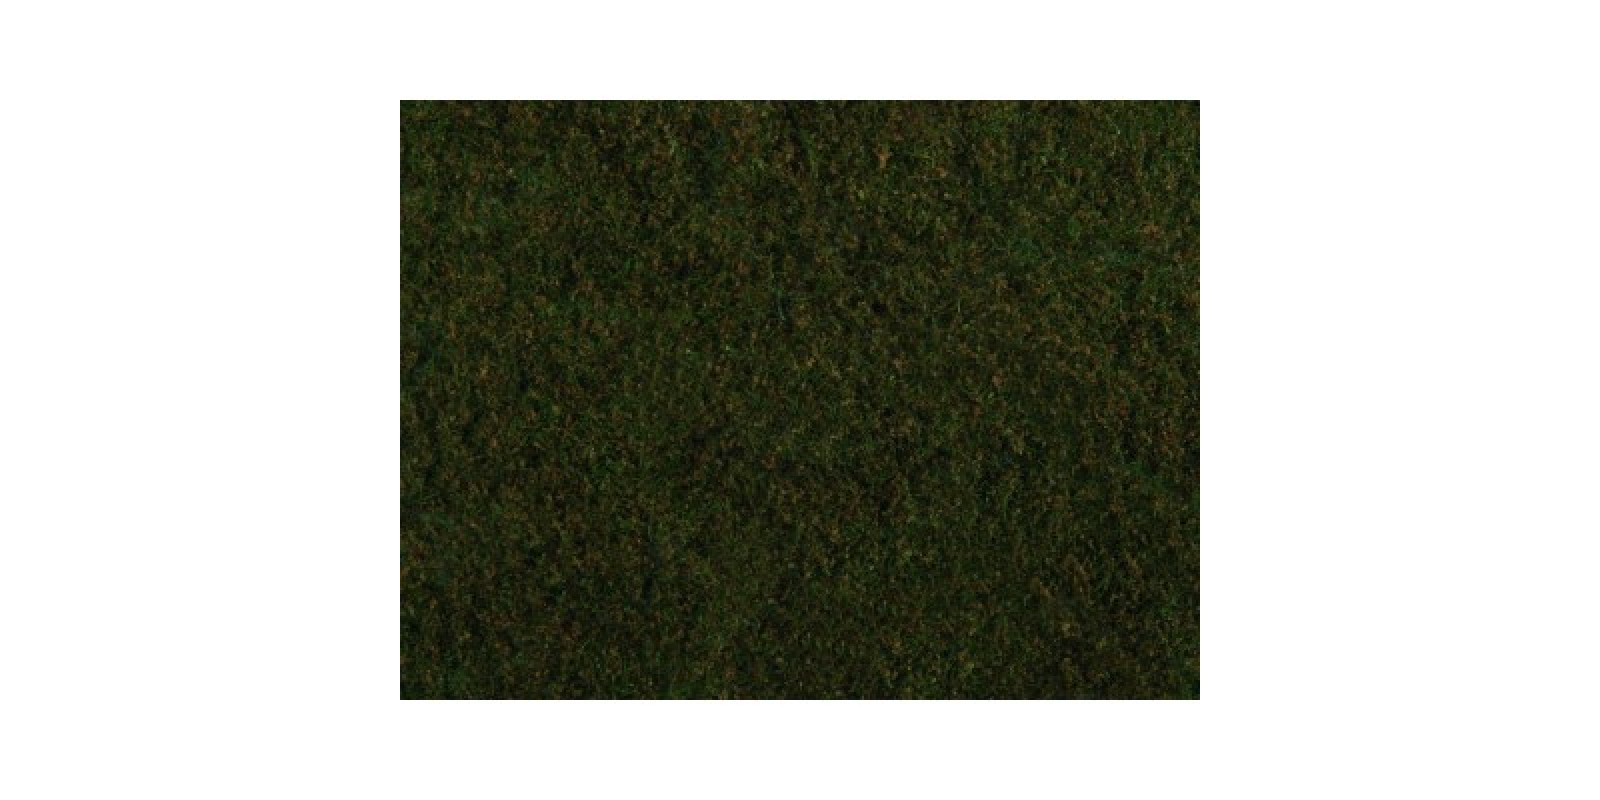 NO07272 Foliage, olive green